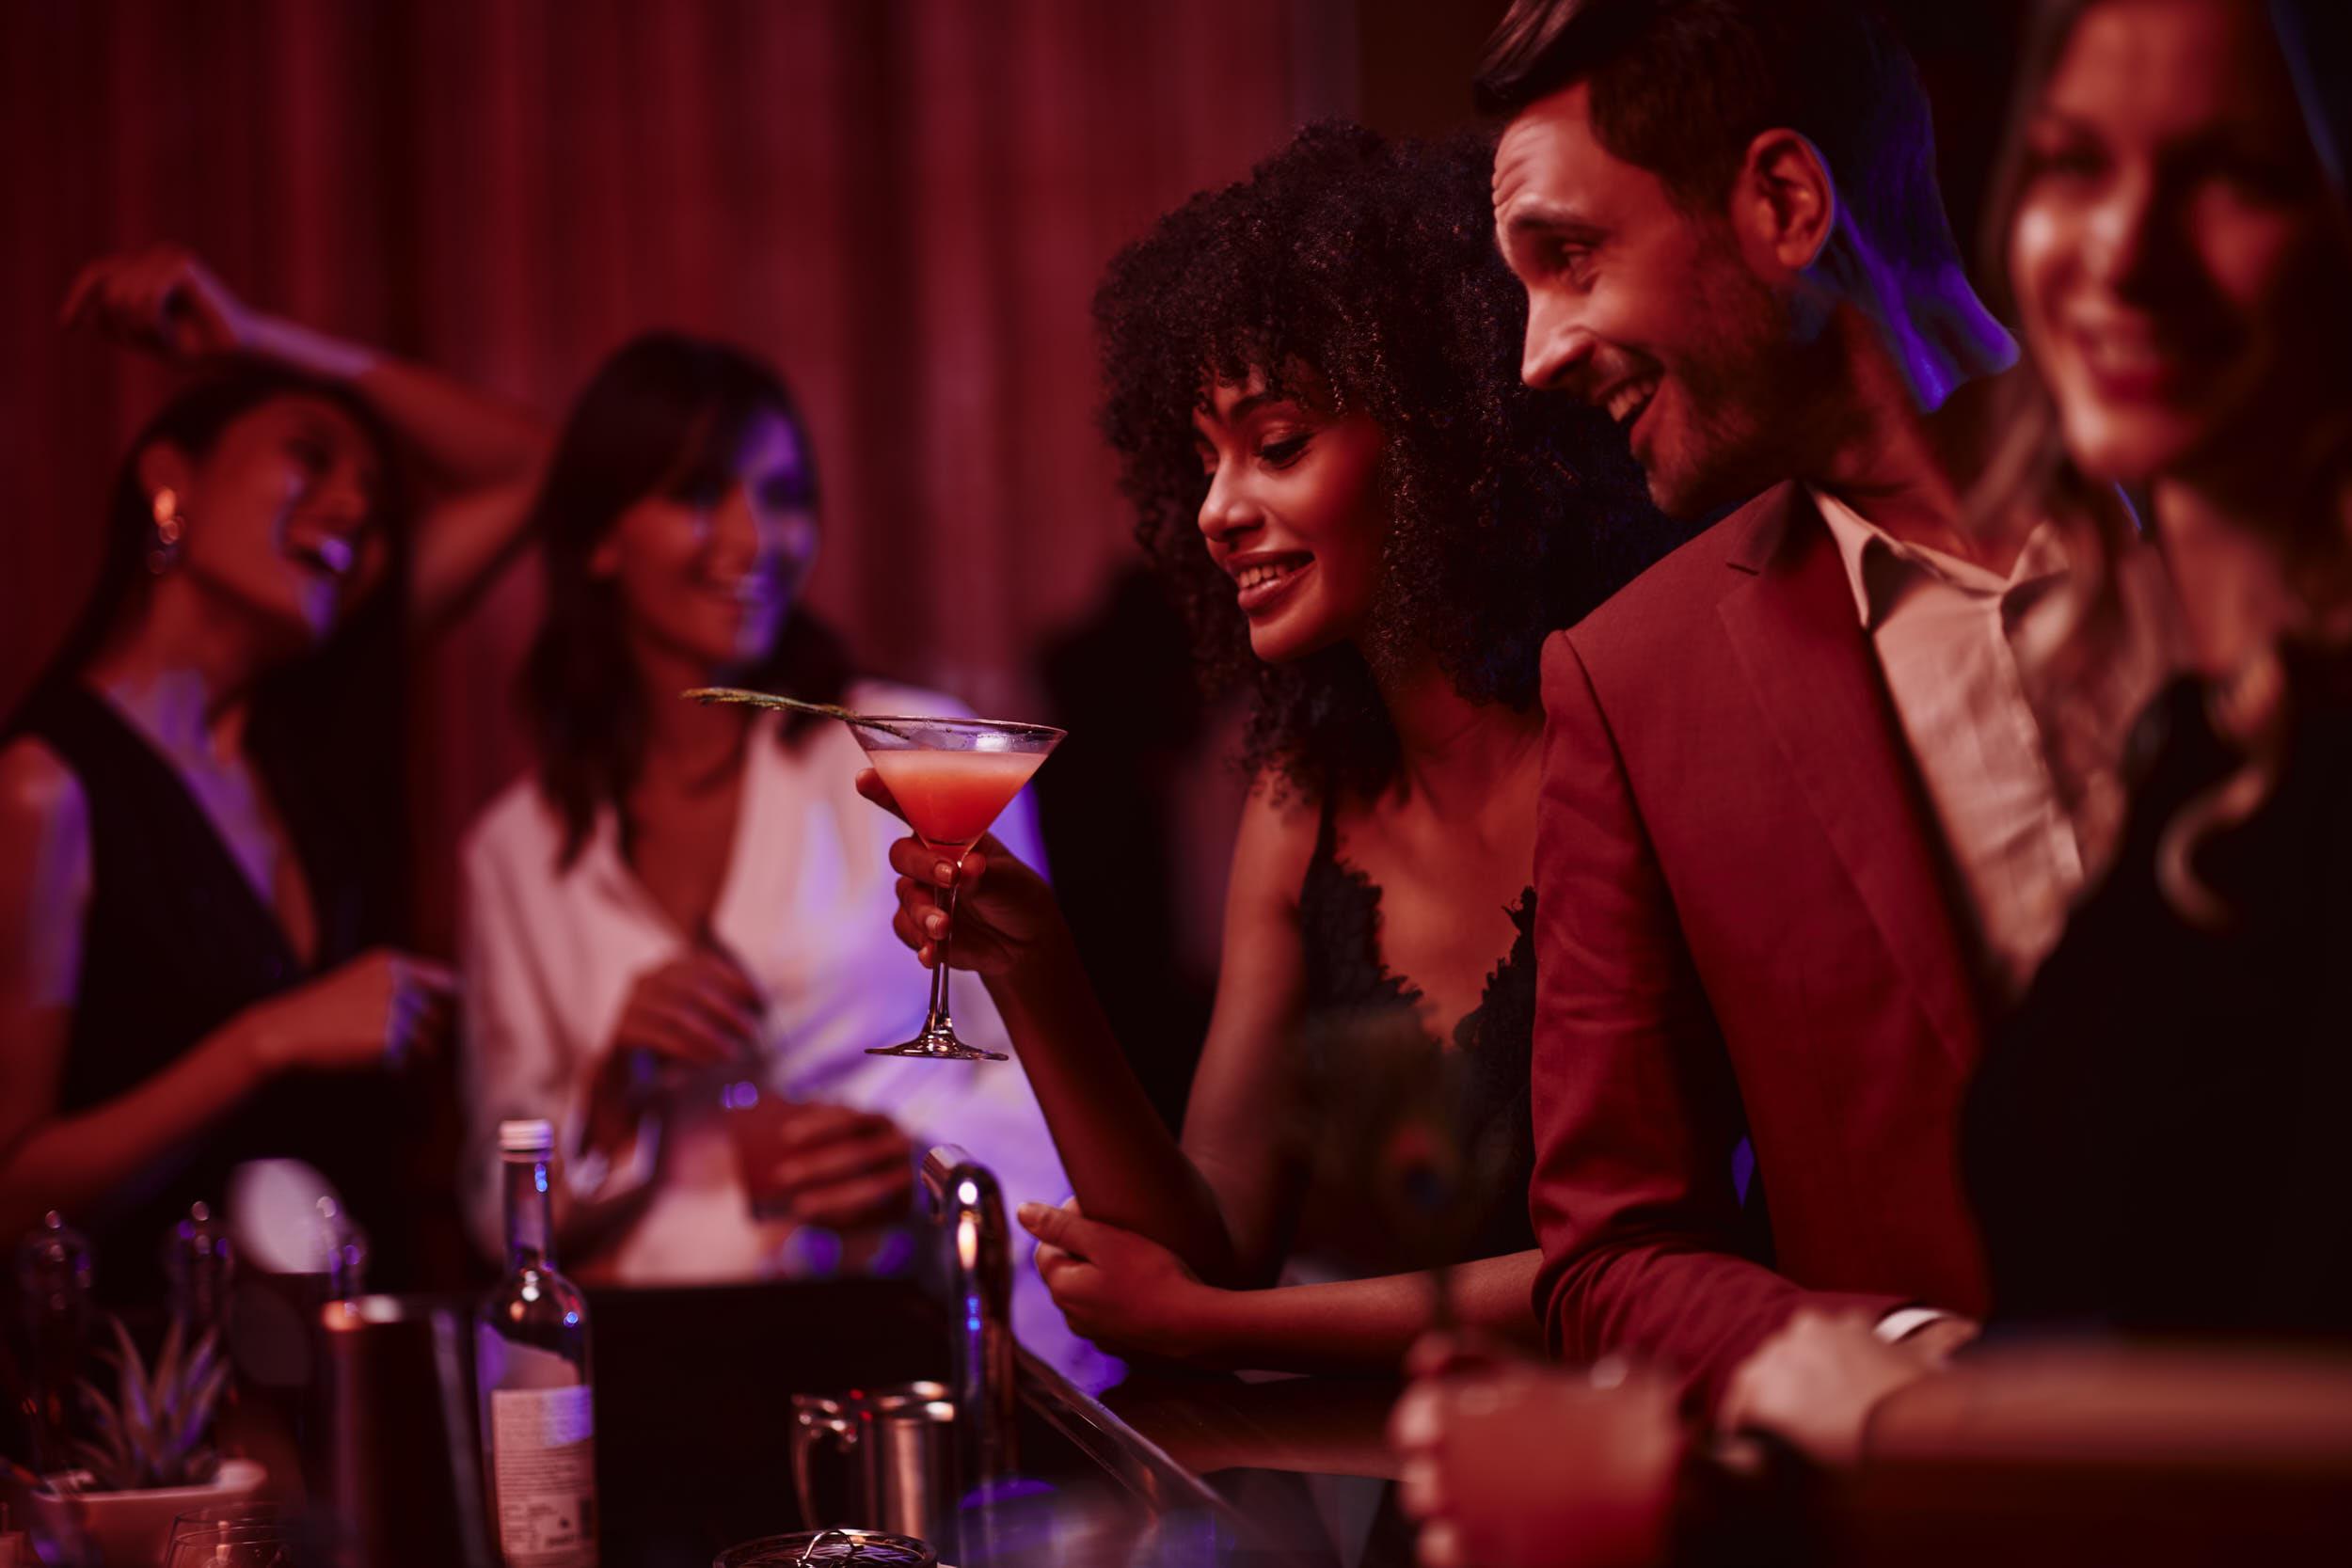 european drinks alcohol lifestyle and still life advertising photographer matthew lloyd shoots peninsula paris